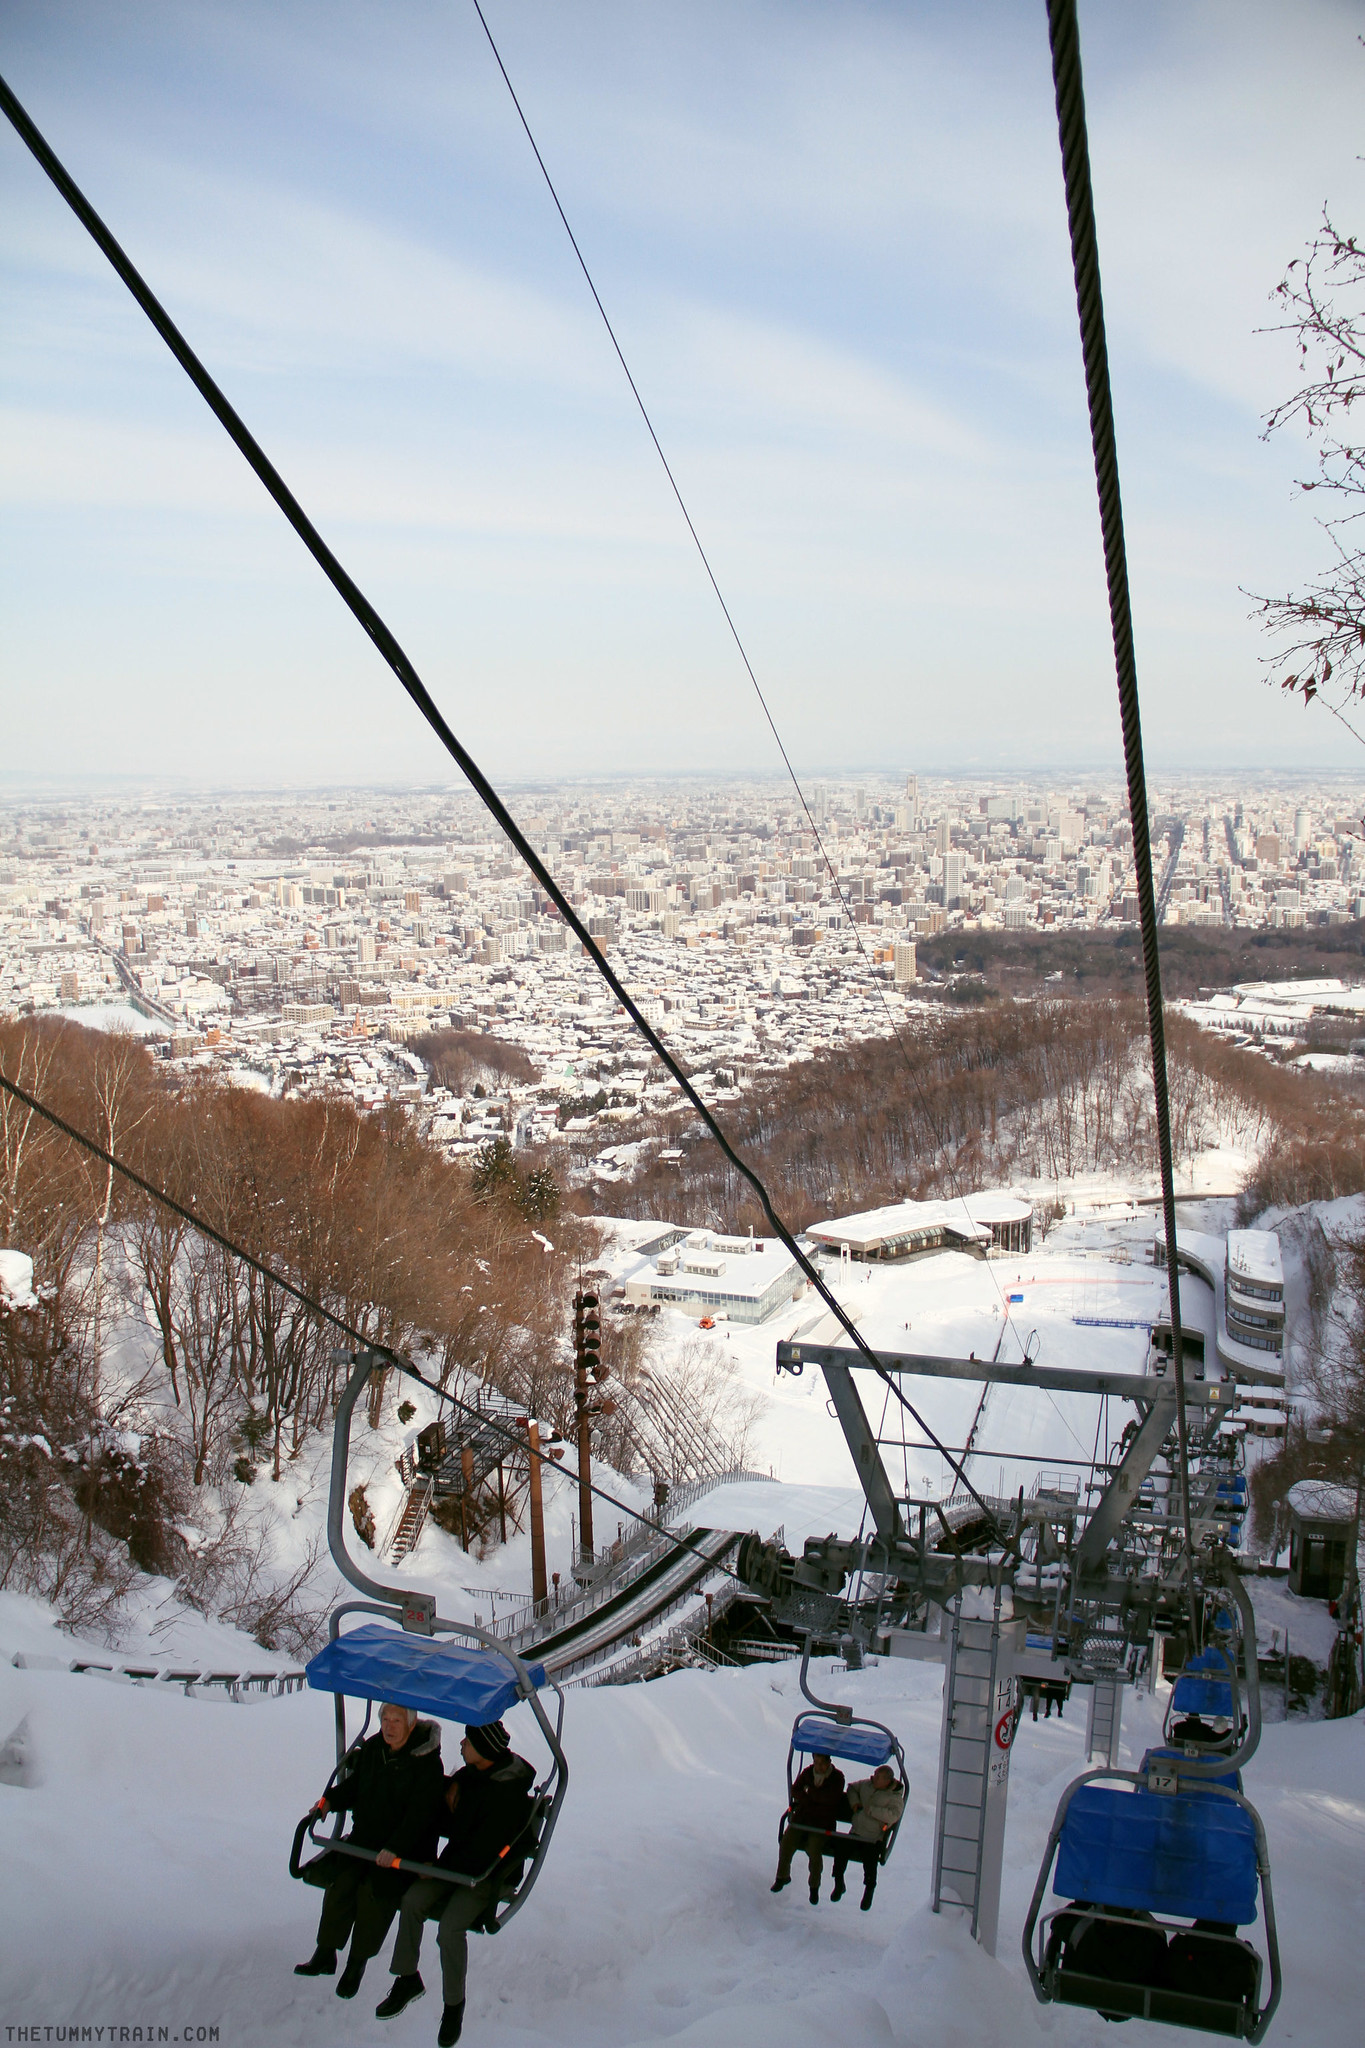 32073884804 f02c665438 k - Sapporo Snow And Smile: 8 Unforgettable Winter Experiences in Sapporo City